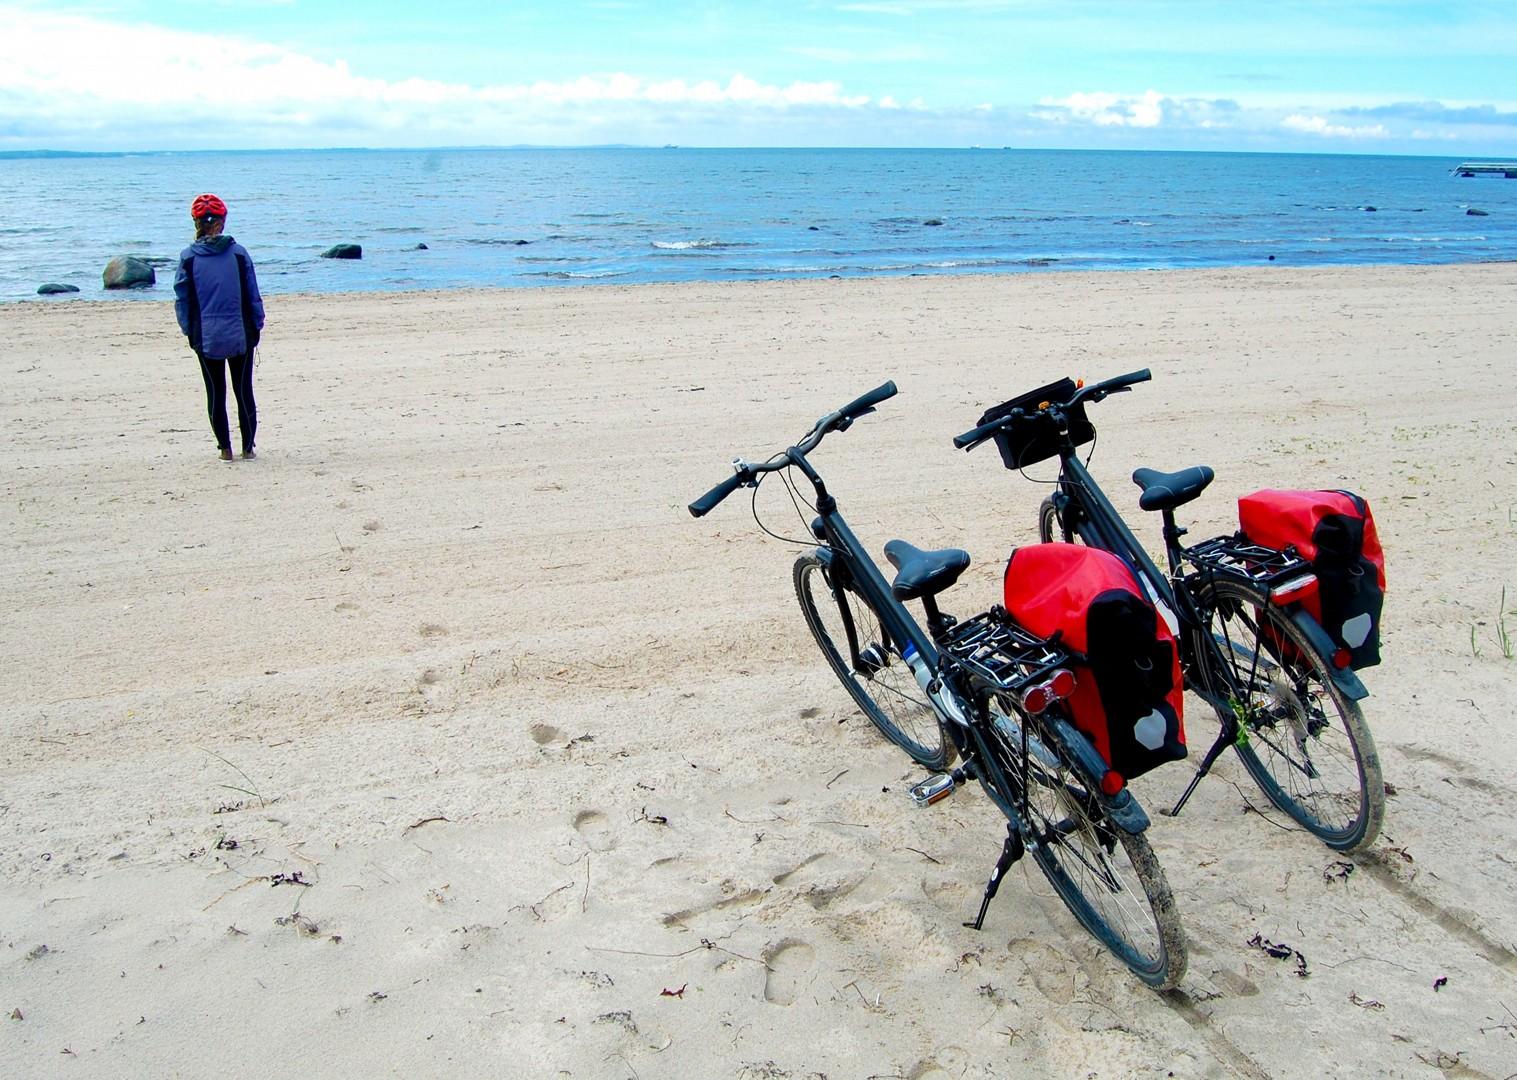 denmark-family-cycling-holiday-coast-beach-views.jpg - NEW! Denmark - Coast, Castles and Copenhagen - Leisure Cycling